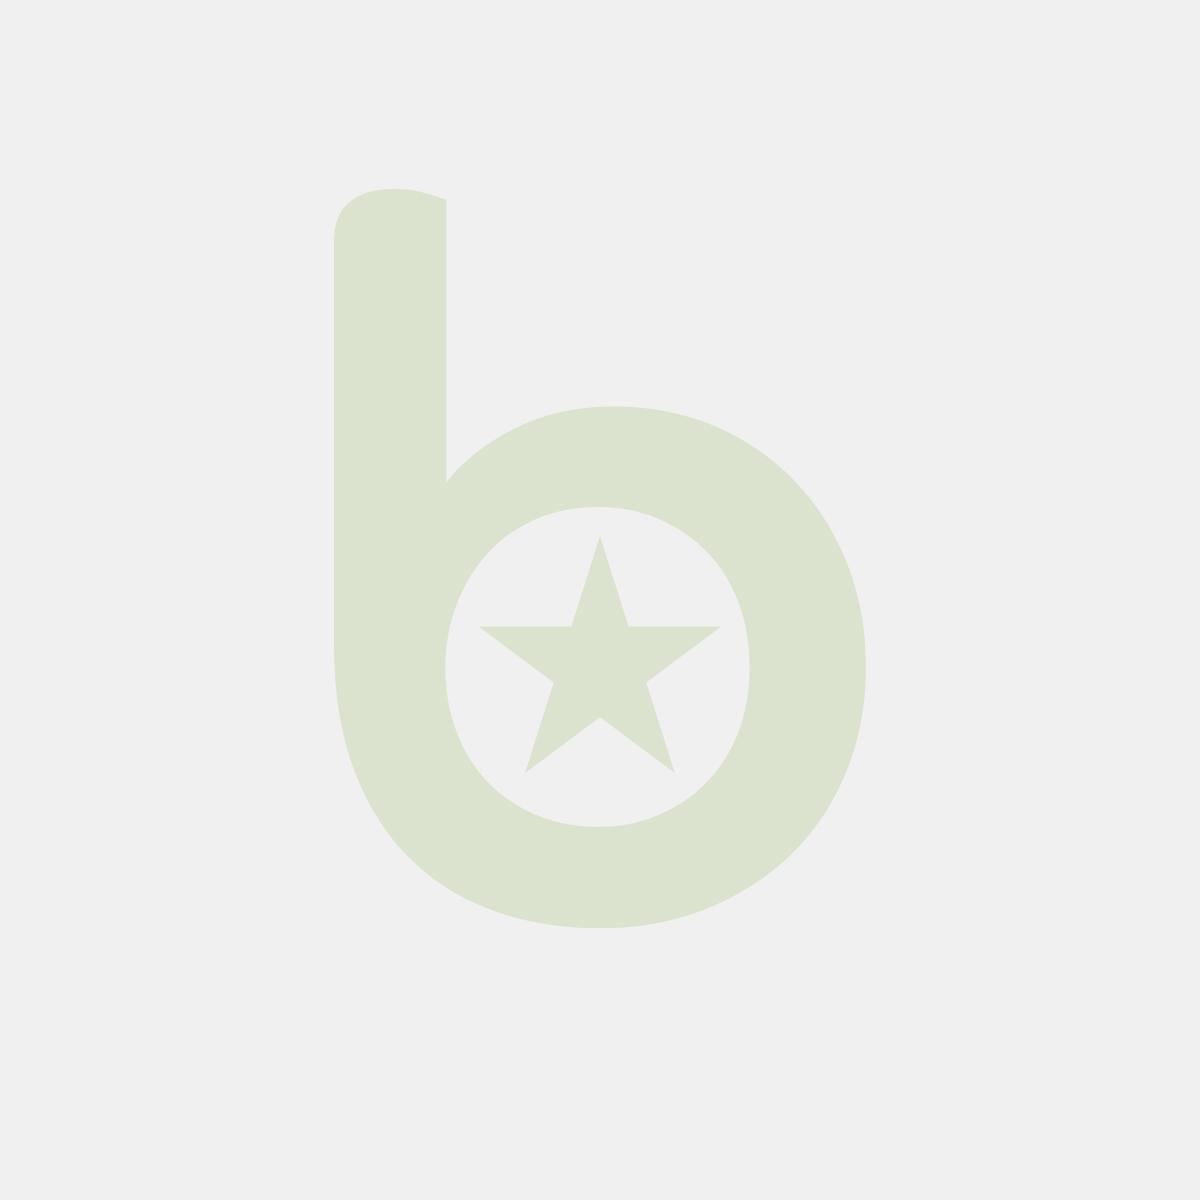 FINGERFOOD - pucharek 100ml czarny PS 5,6x7,7 op. 10 sztuk